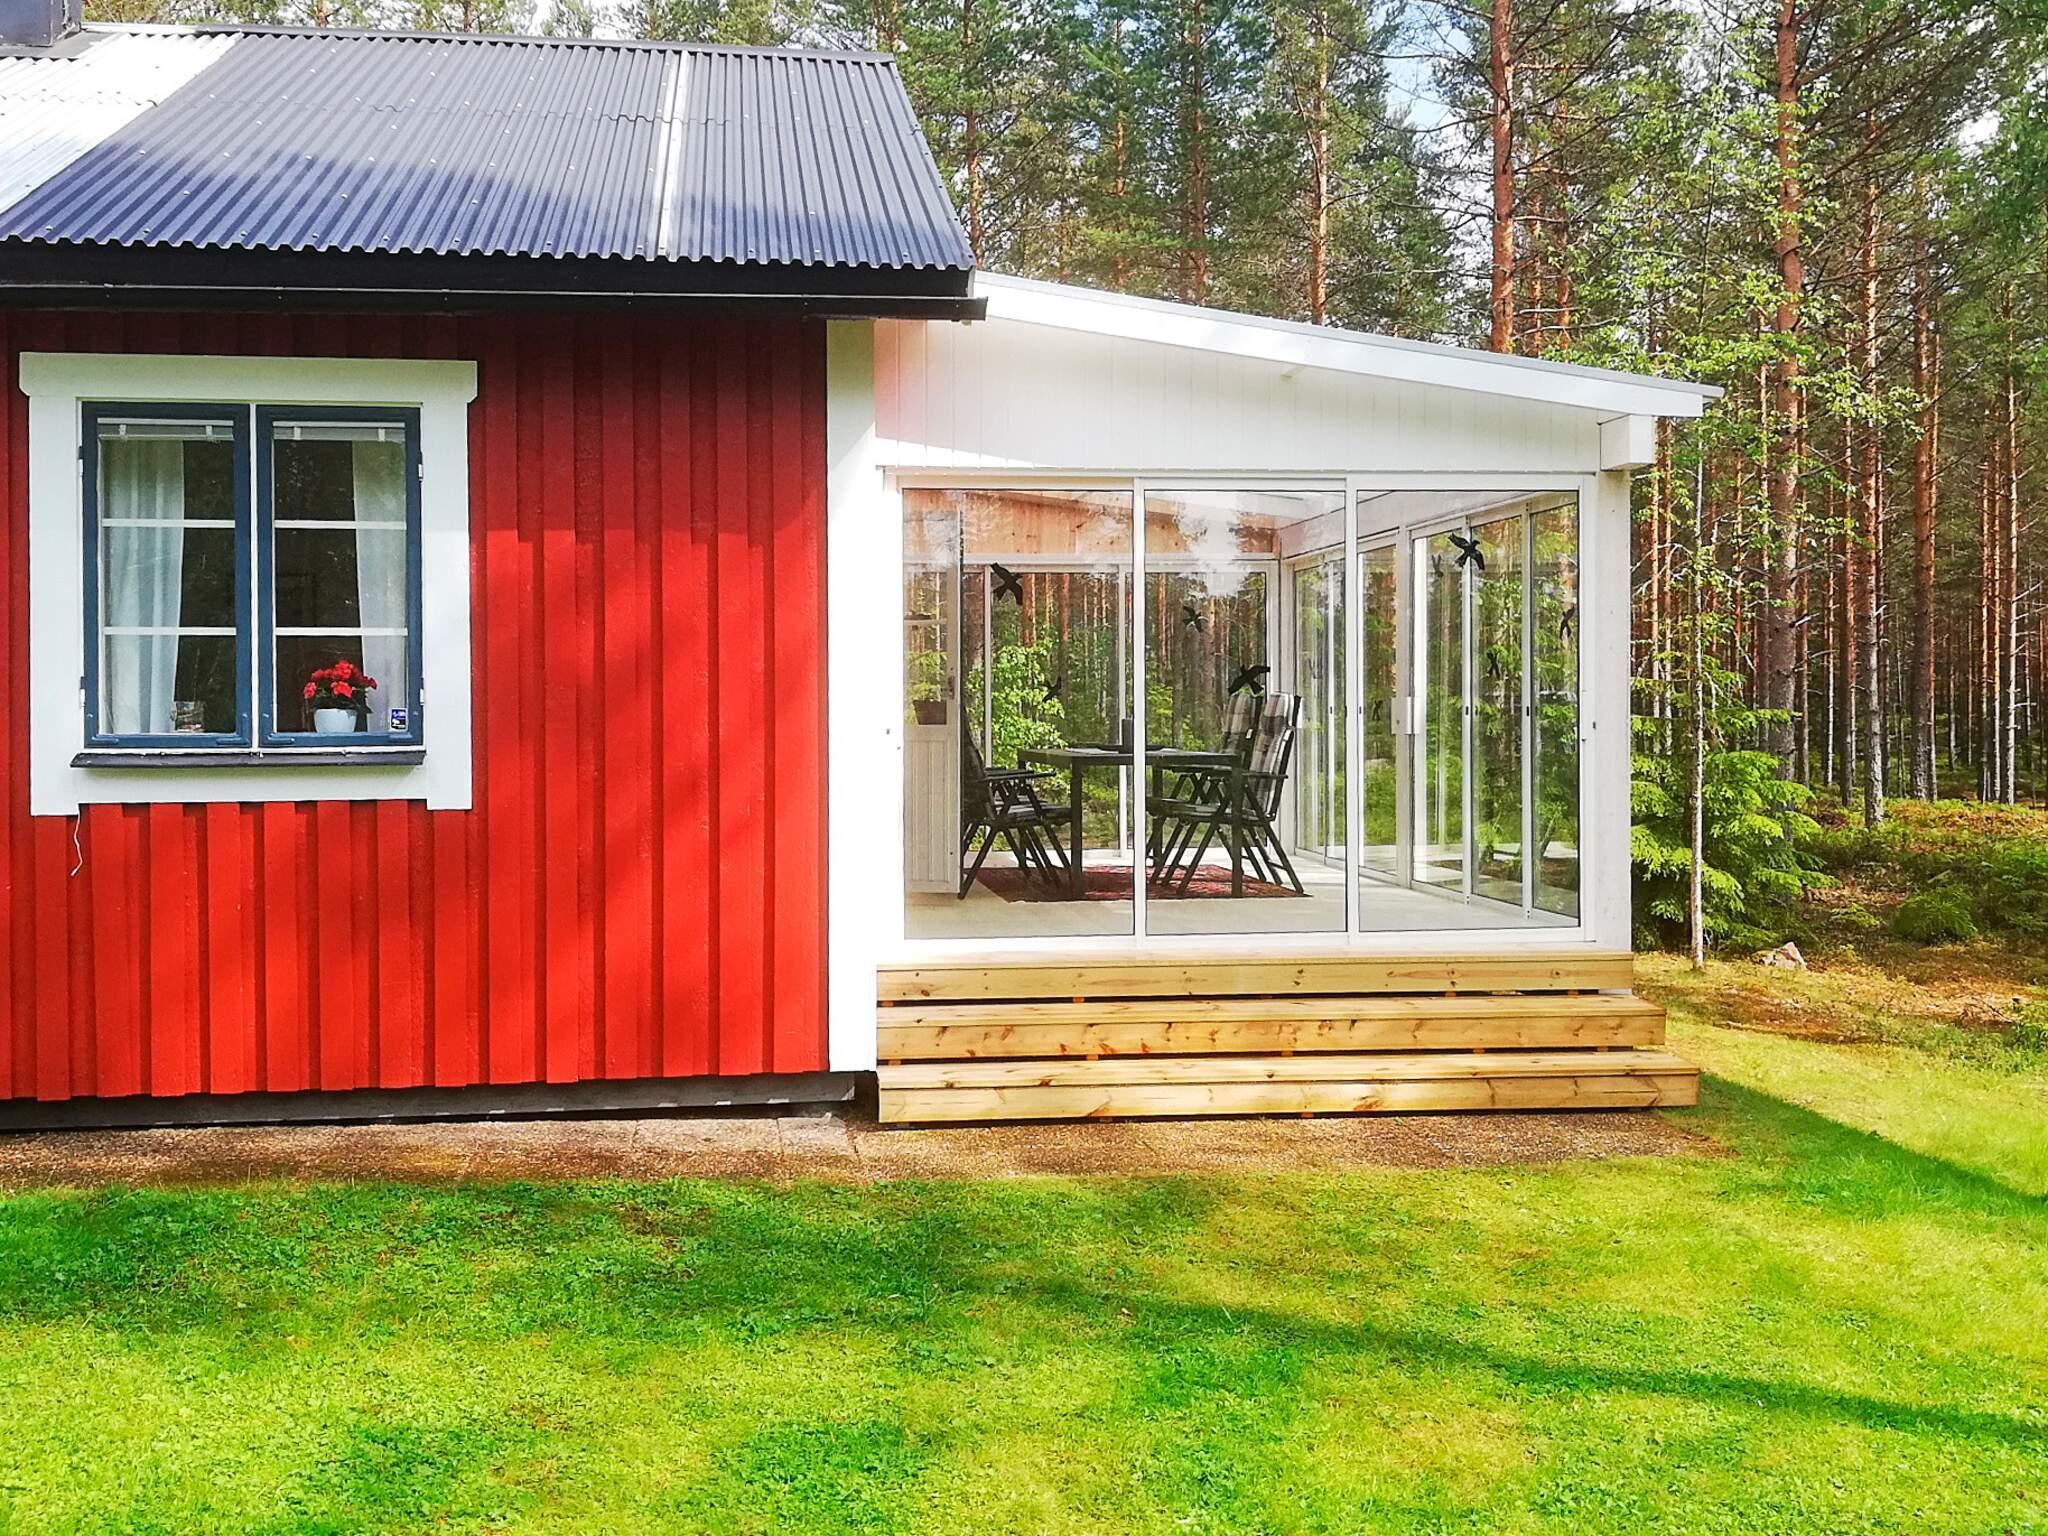 Ferienhaus Ivebo (87165), Östmark, Värmlands län, Mittelschweden, Schweden, Bild 11